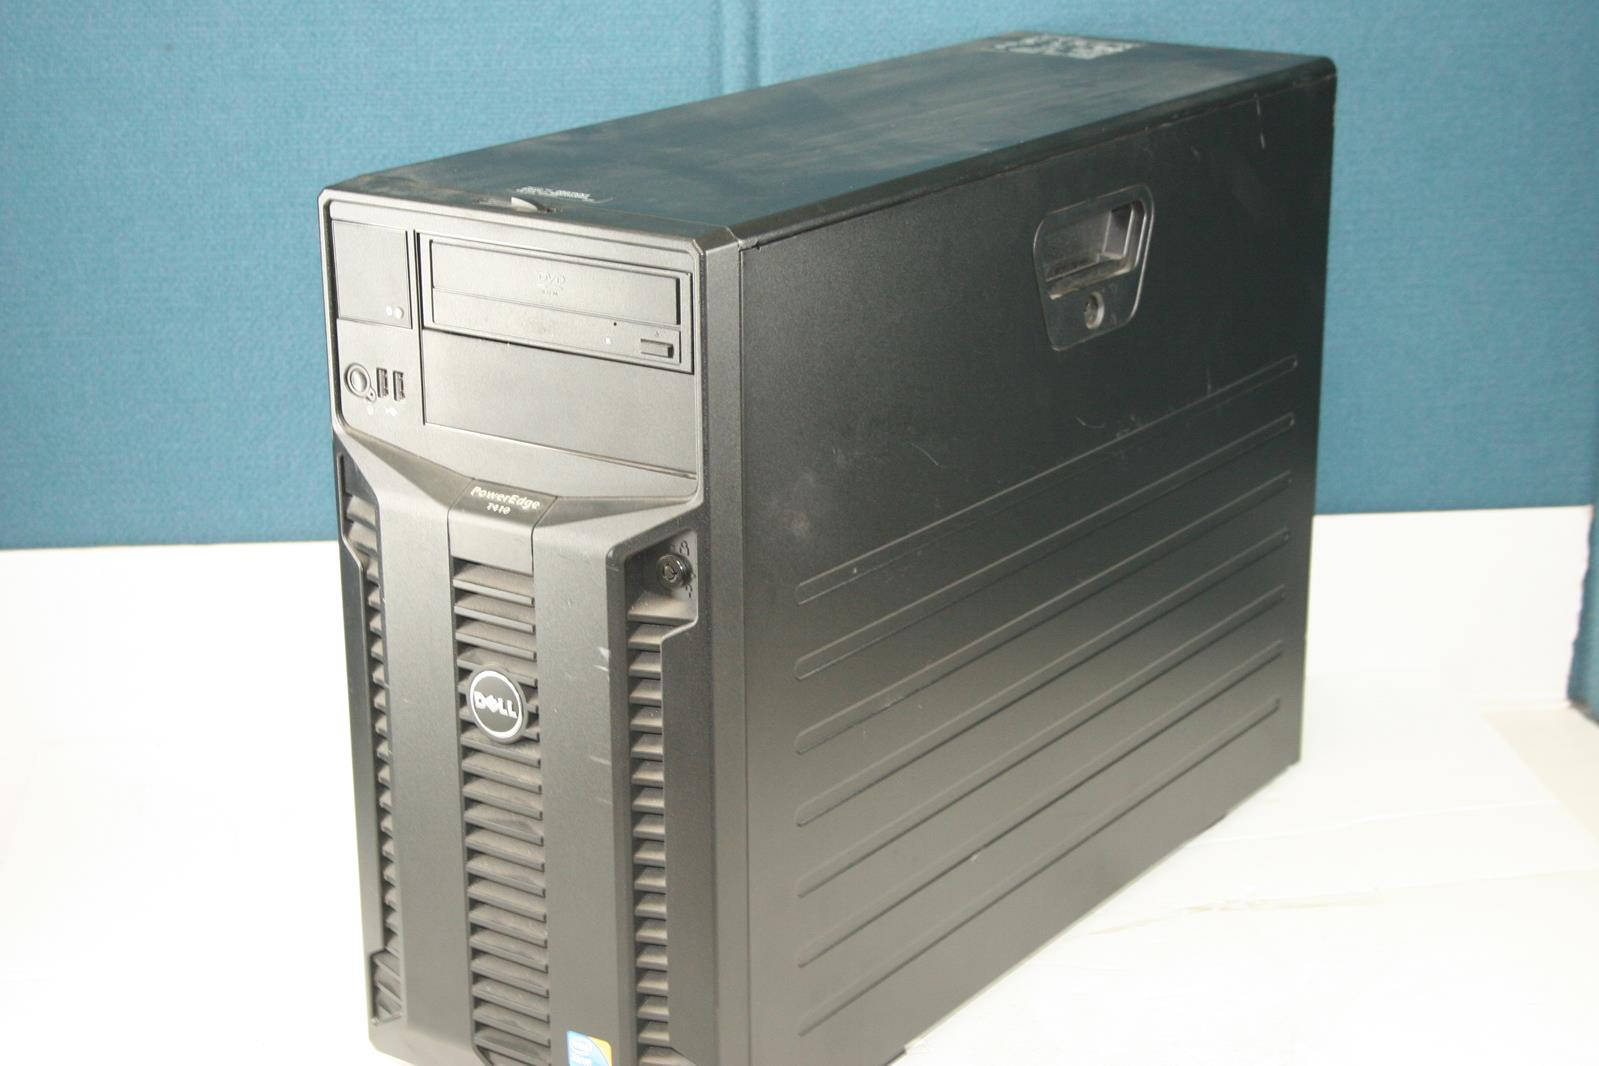 DELL POWEREDGE T410 Dual E5620 INTEL XEON 2 4 GHZ Server